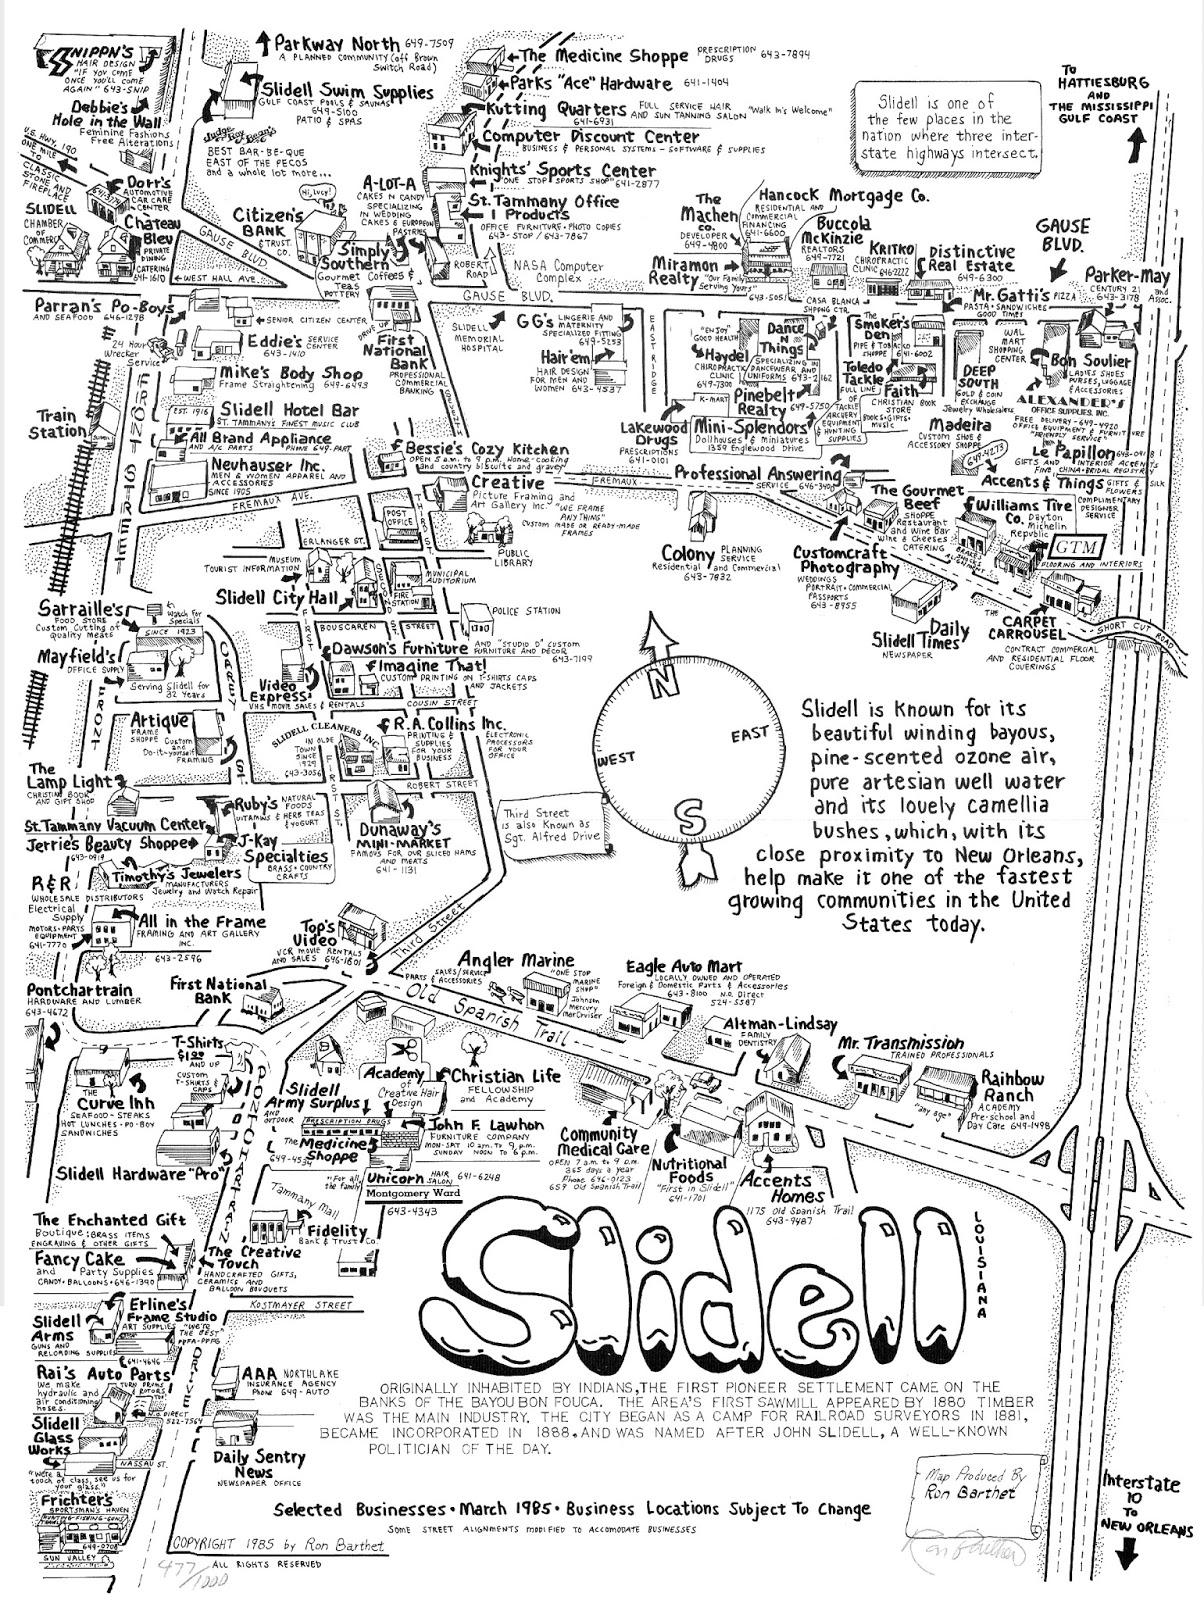 Tammany Family: Slidell Map - 1985 on